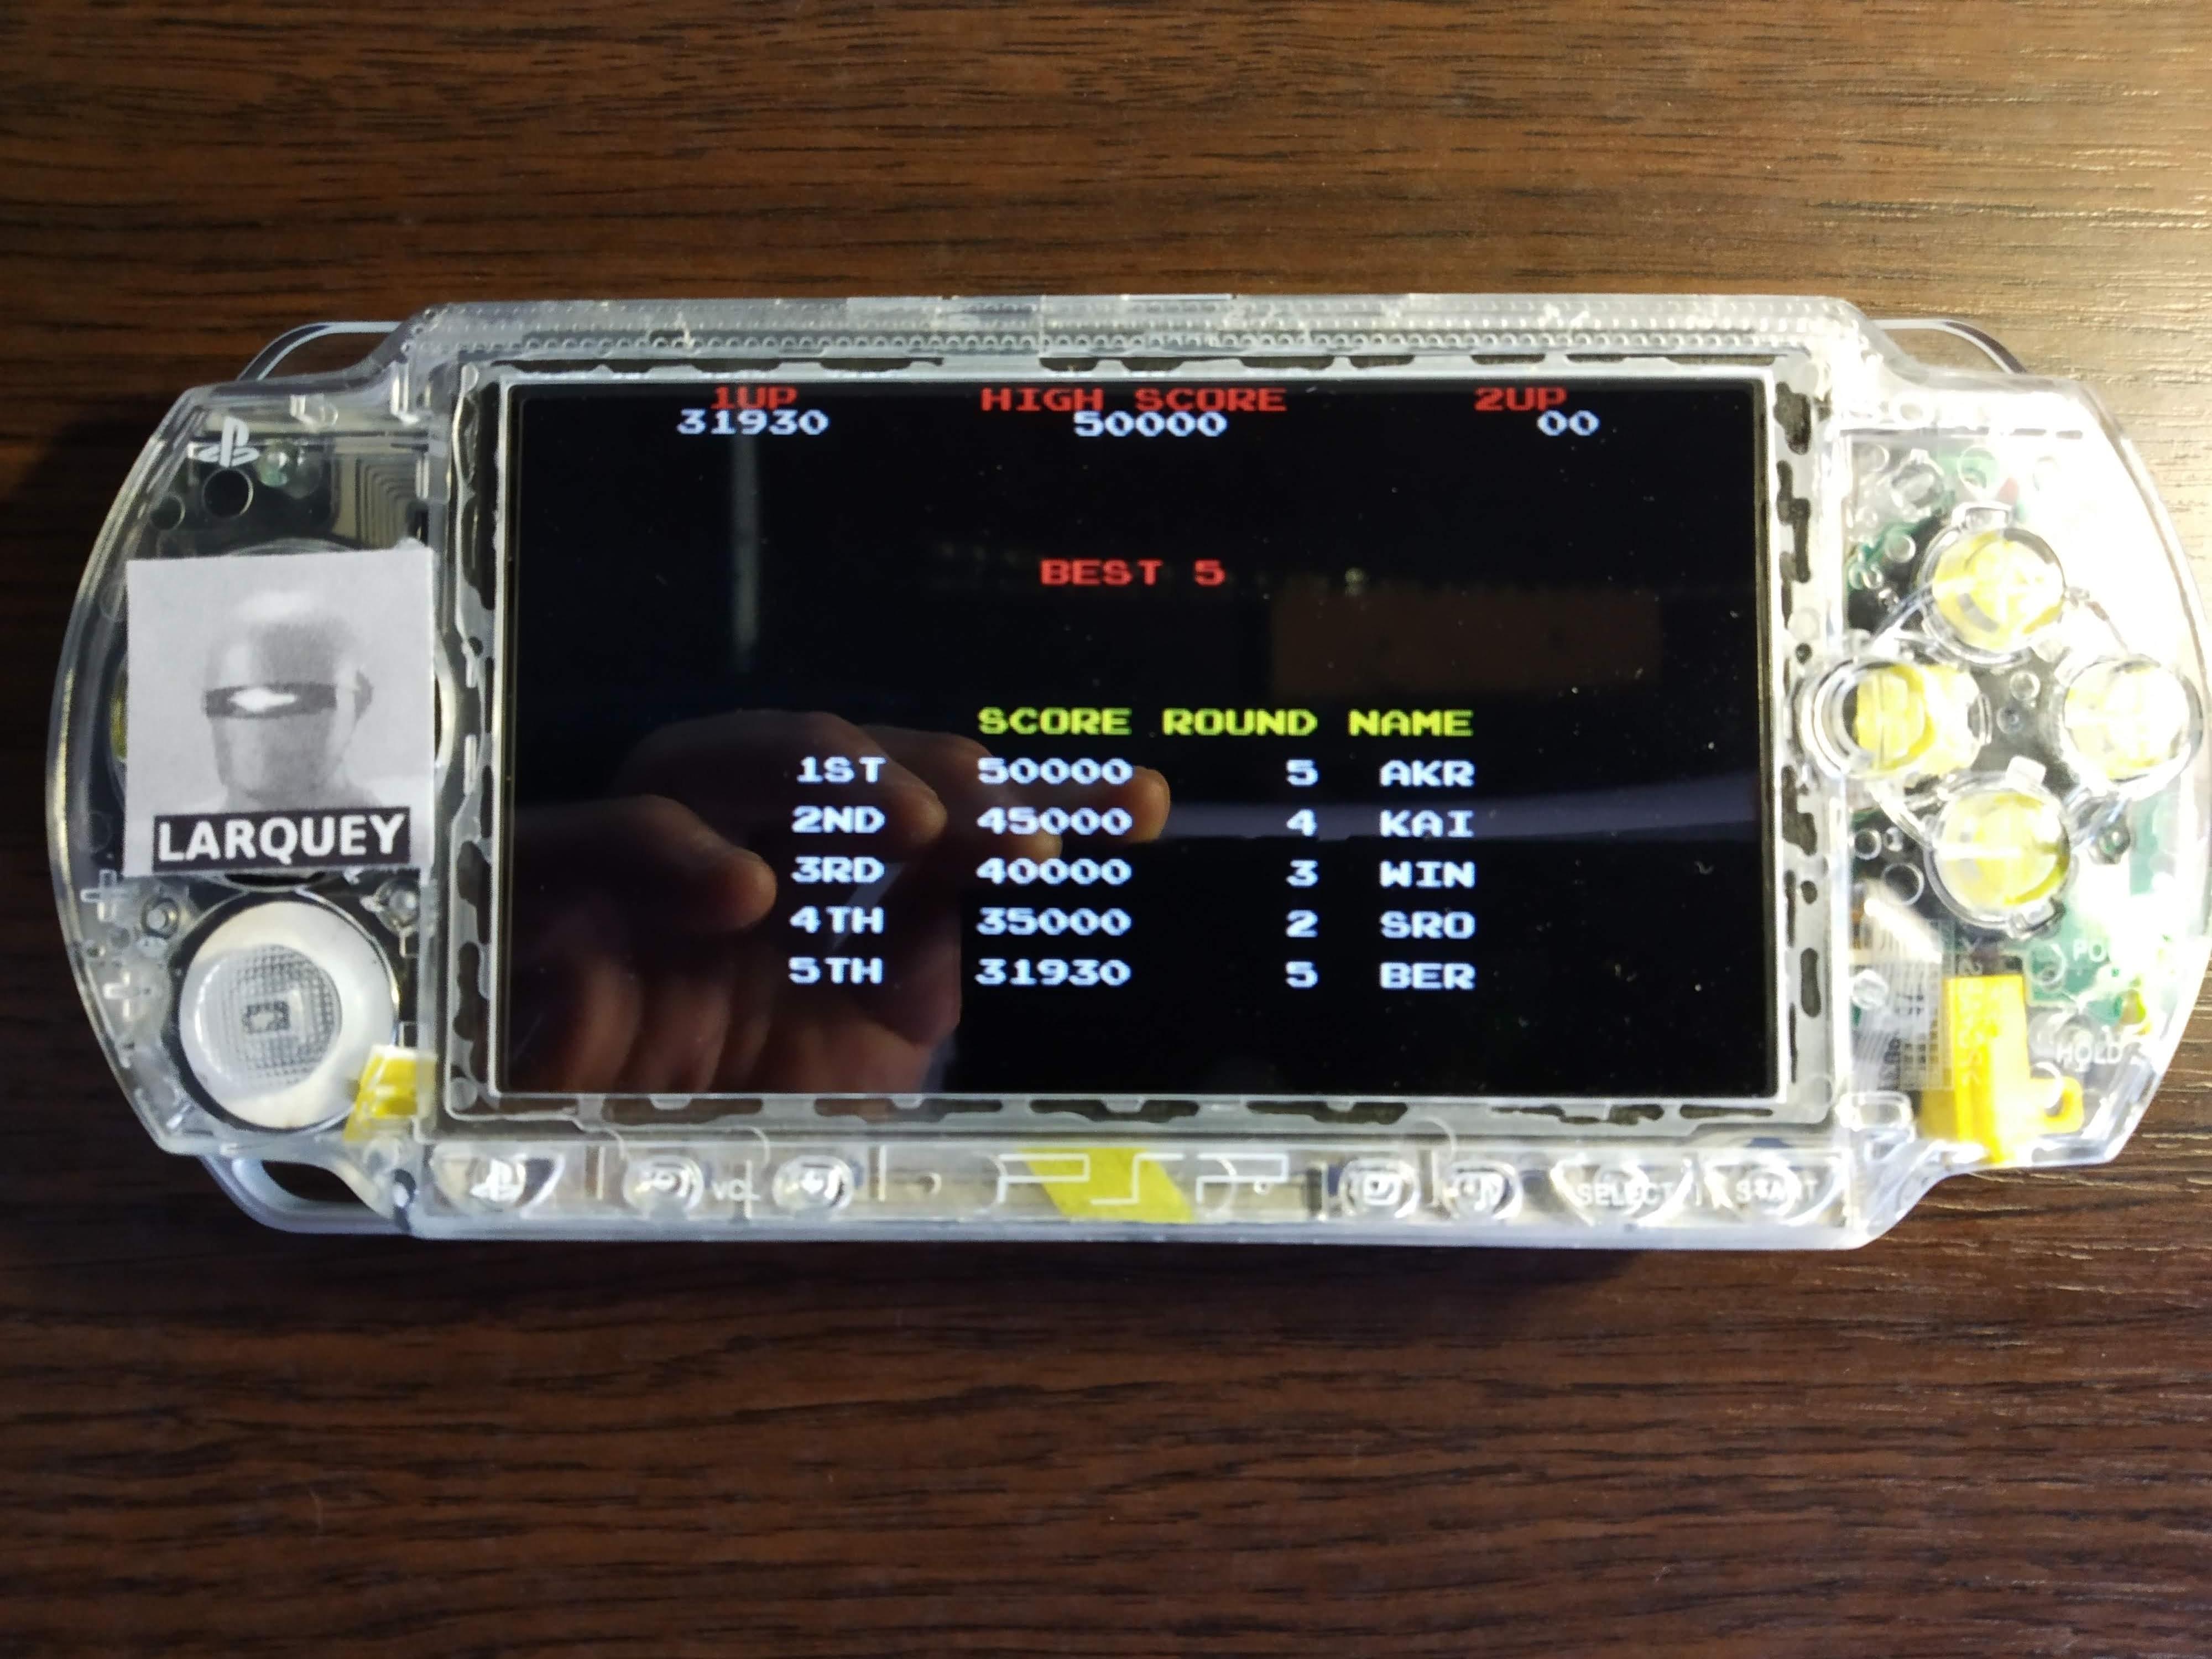 Larquey: Taito Legends: Power-Up: Raimais (PSP) 31,930 points on 2019-12-15 07:57:55